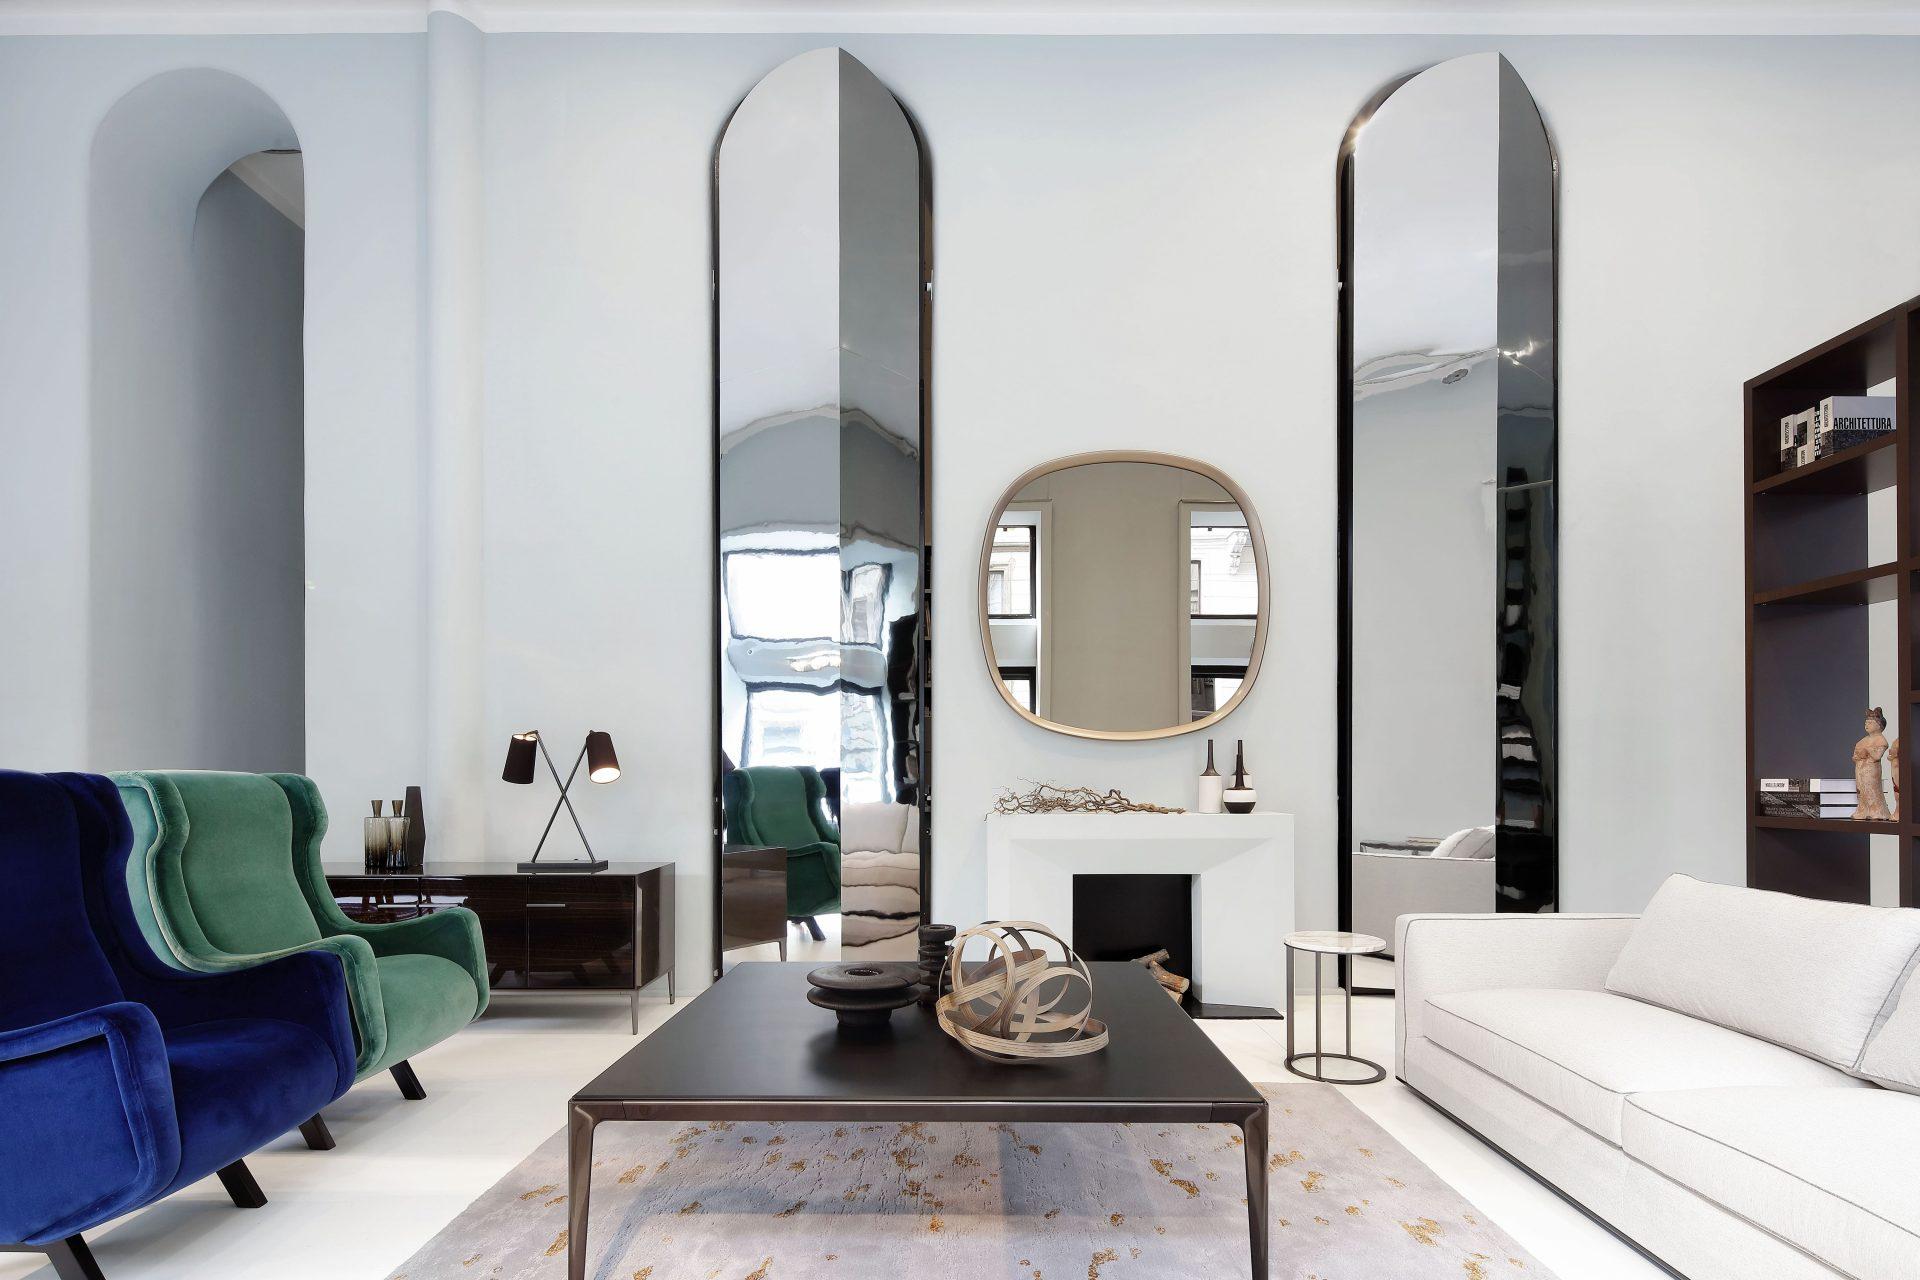 italian furniture showroom with green sofa and white sofa and carpet